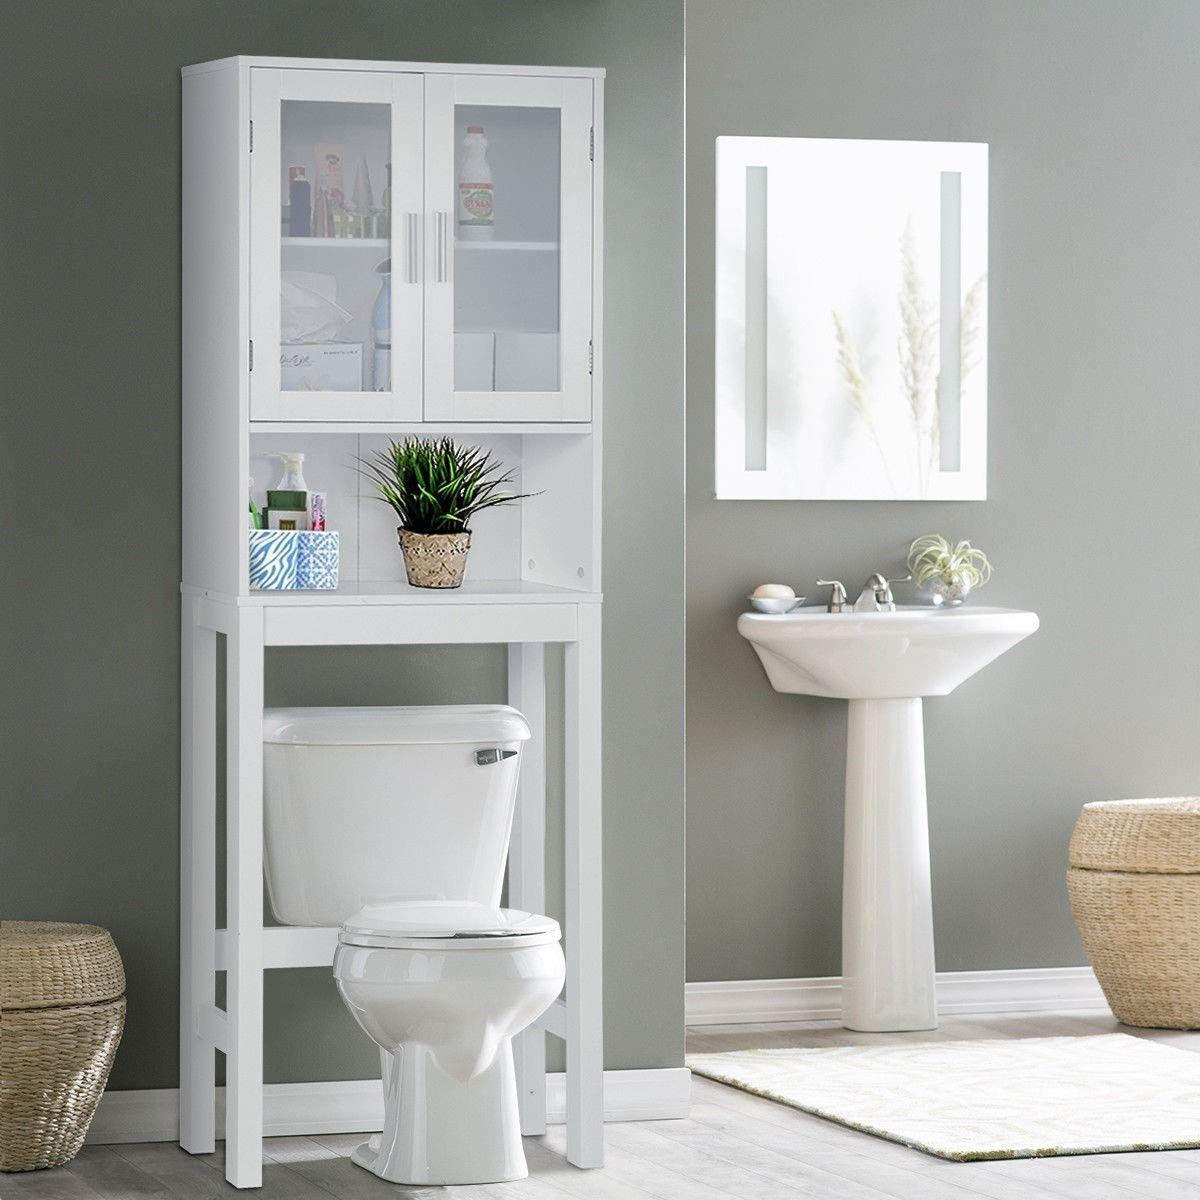 Bestcomfort Bathroom Organizer Over Toilet Storage Above The Toilet S Rangement Au Dessus De La Toilette Stockage De Toilette Organisation De La Salle De Bain